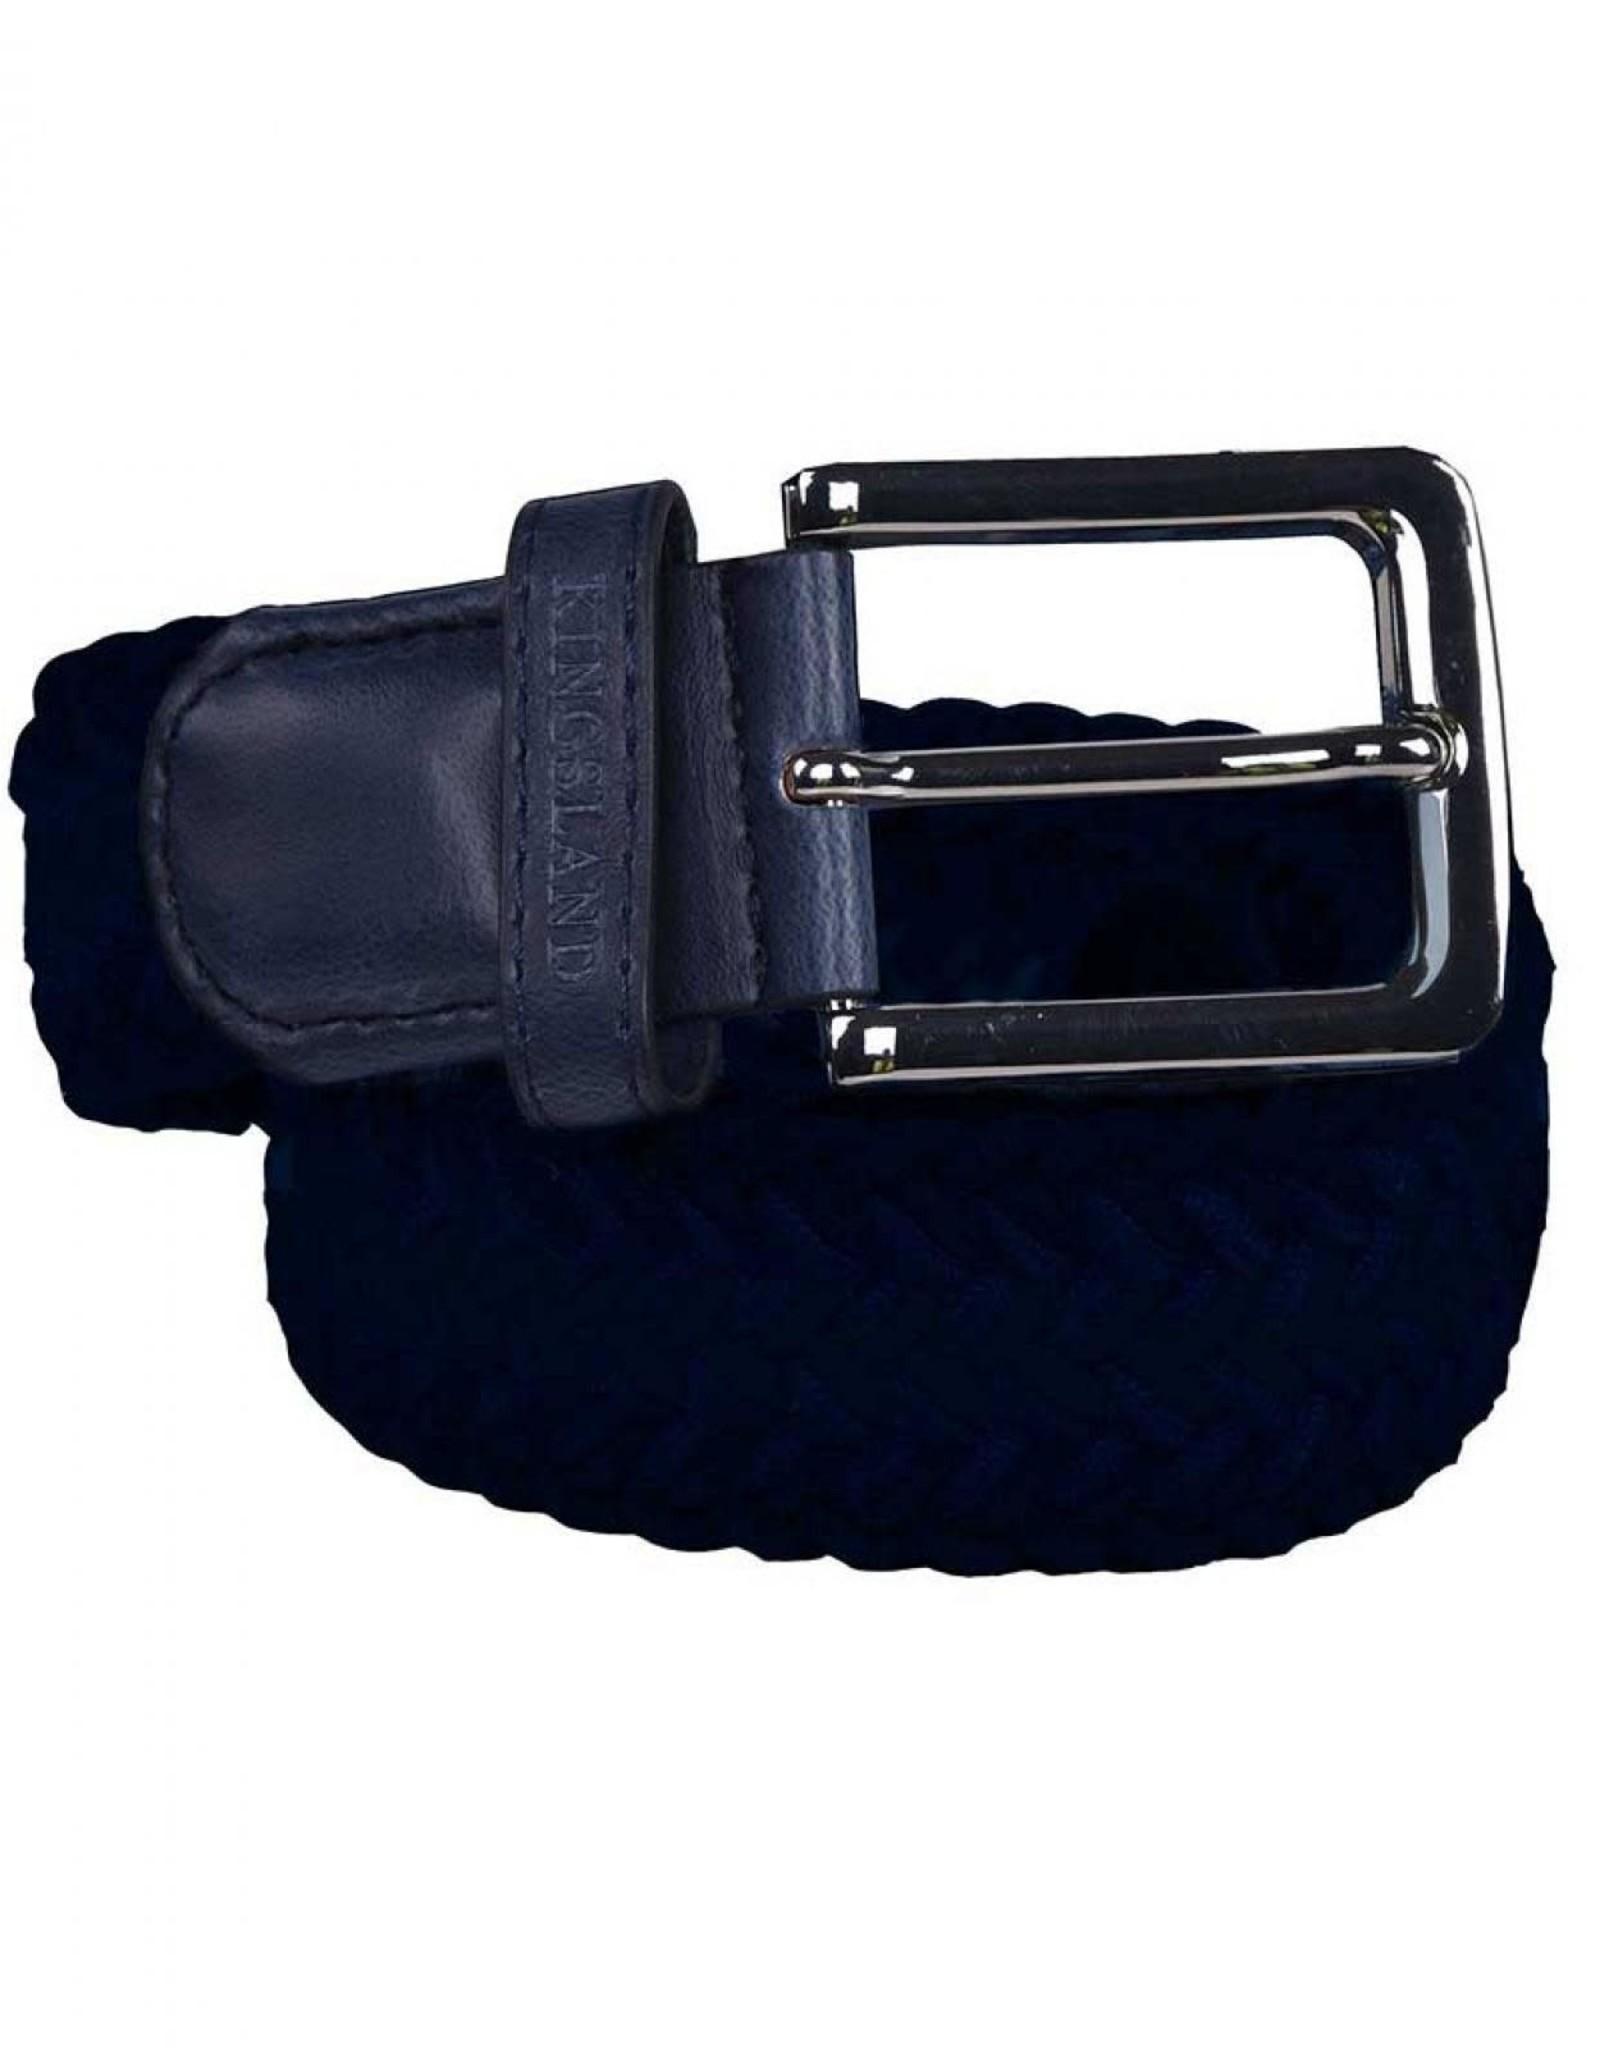 Kingsland Kingsland braided belt Navy